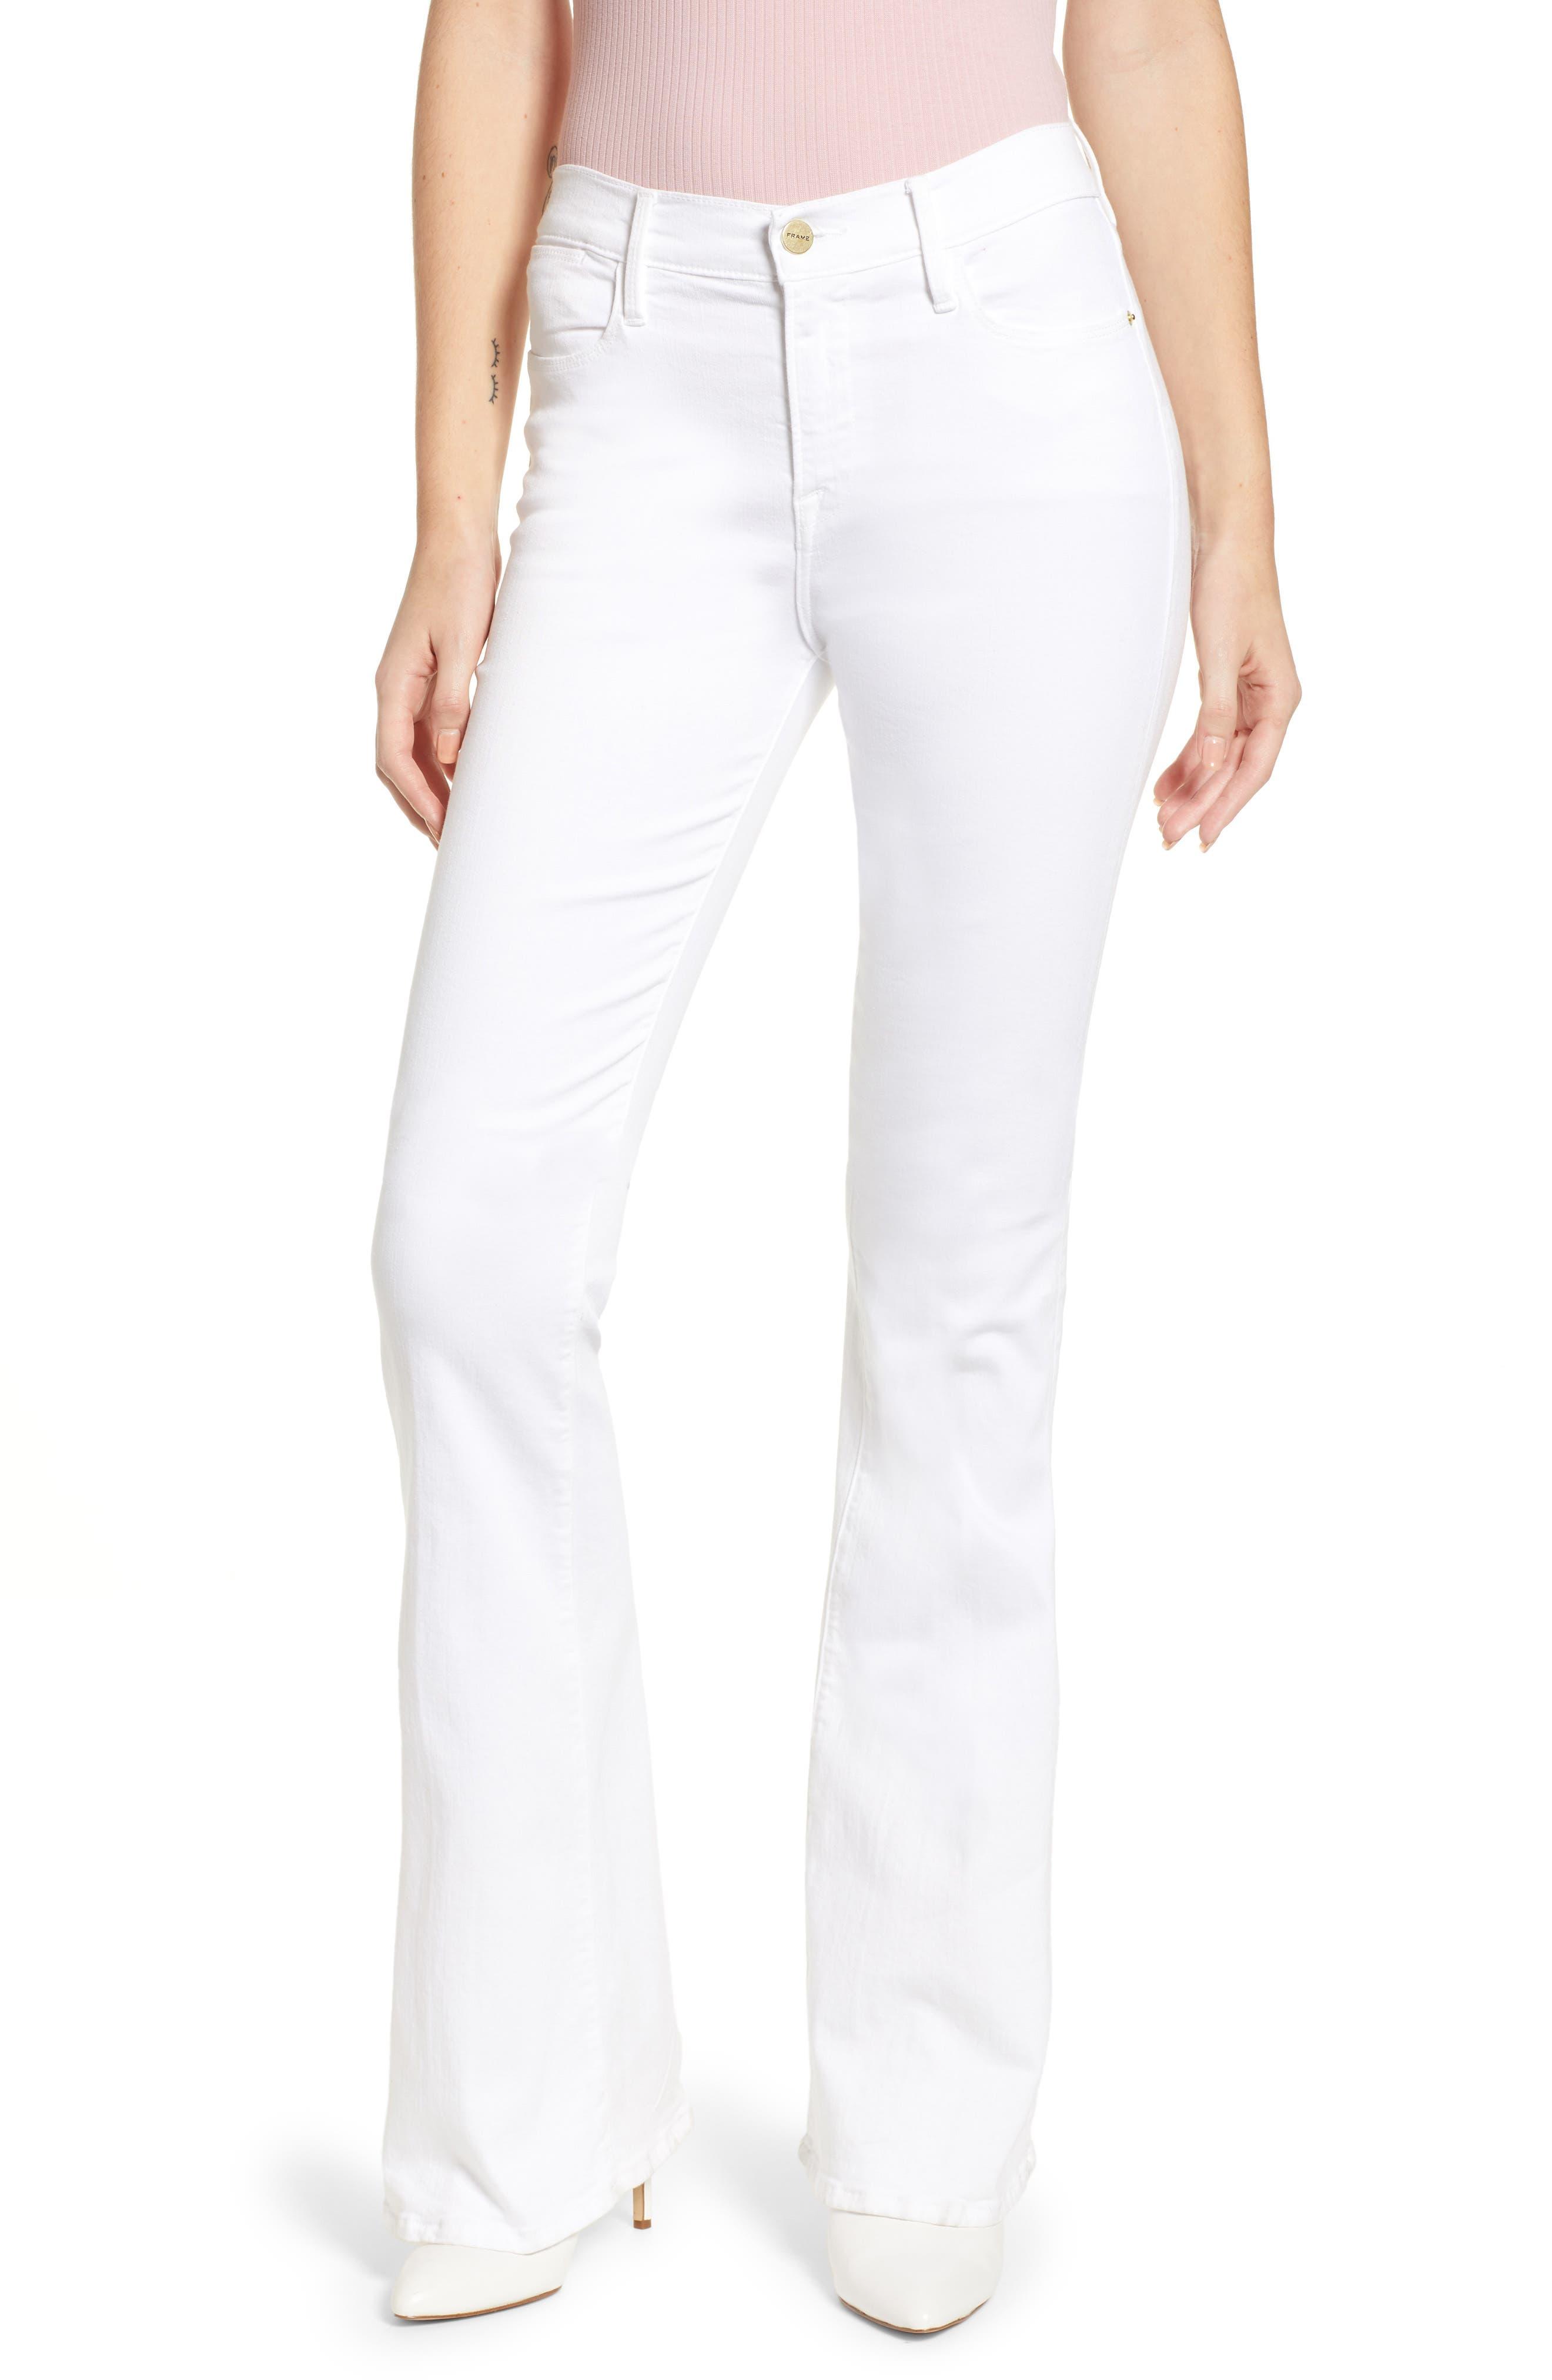 60s – 70s Pants, Jeans, Hippie, Bell Bottoms, Jumpsuits Womens Frame Le High Flare Jeans $210.00 AT vintagedancer.com